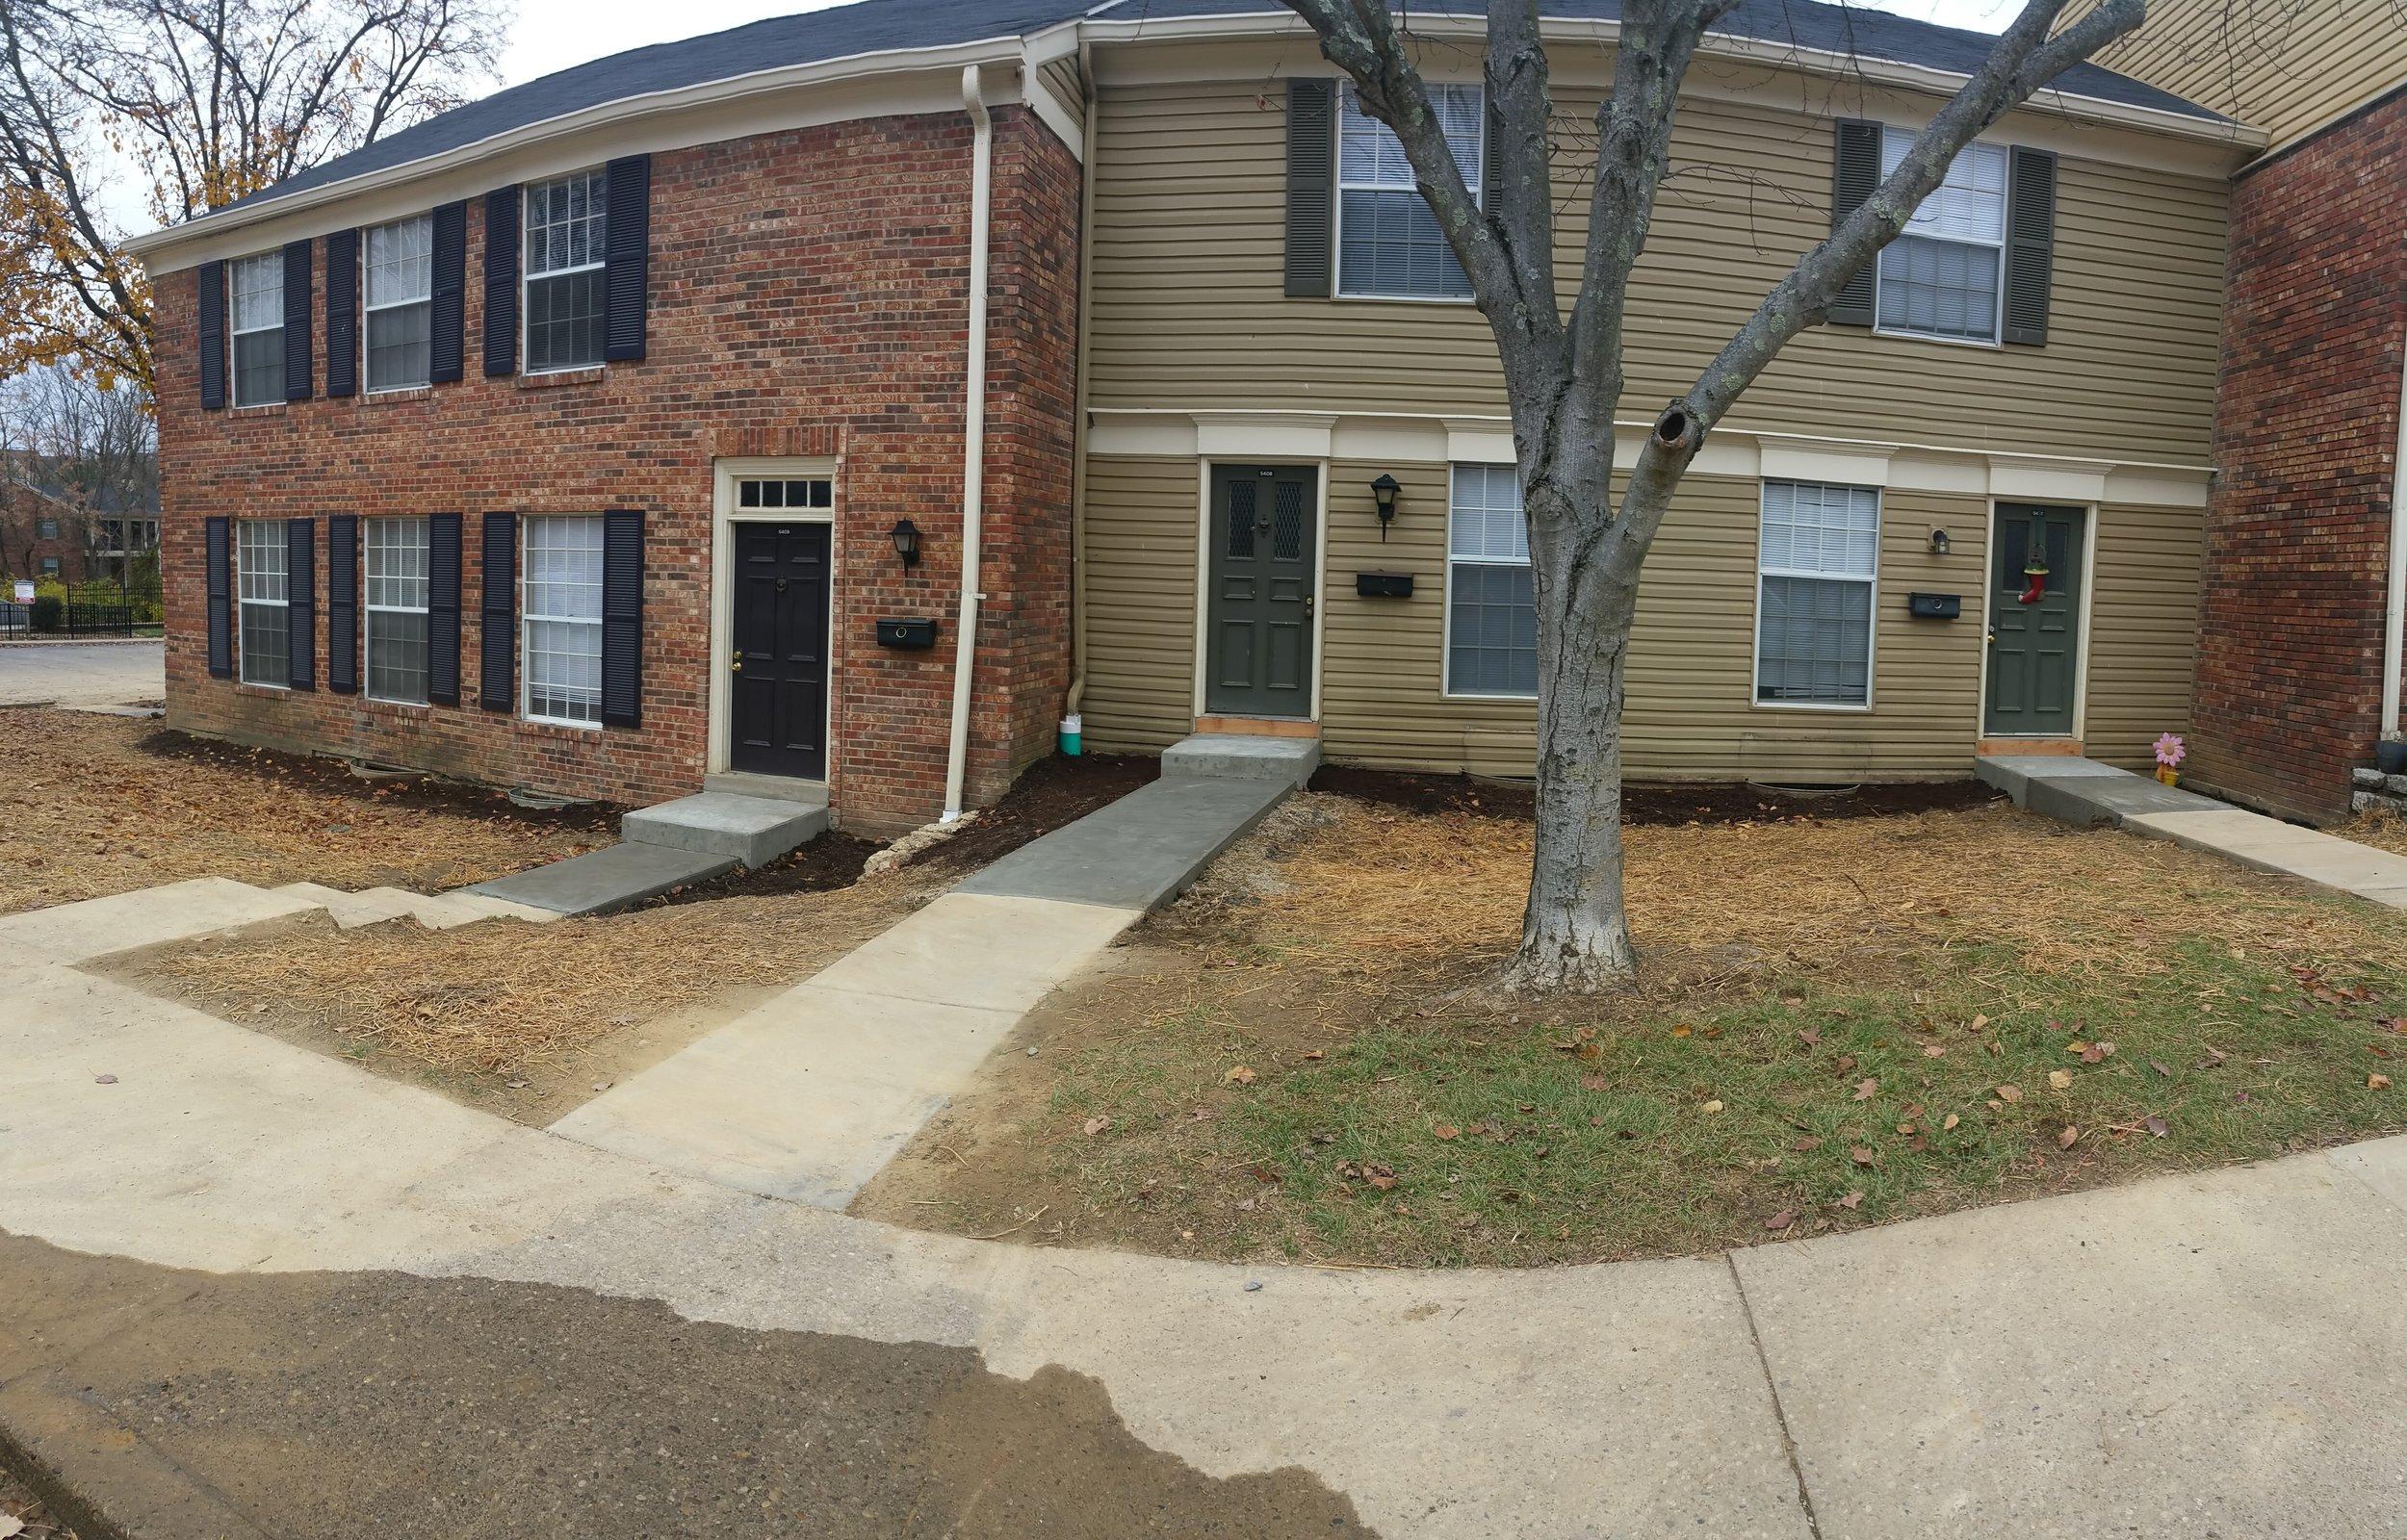 Area fully restored.